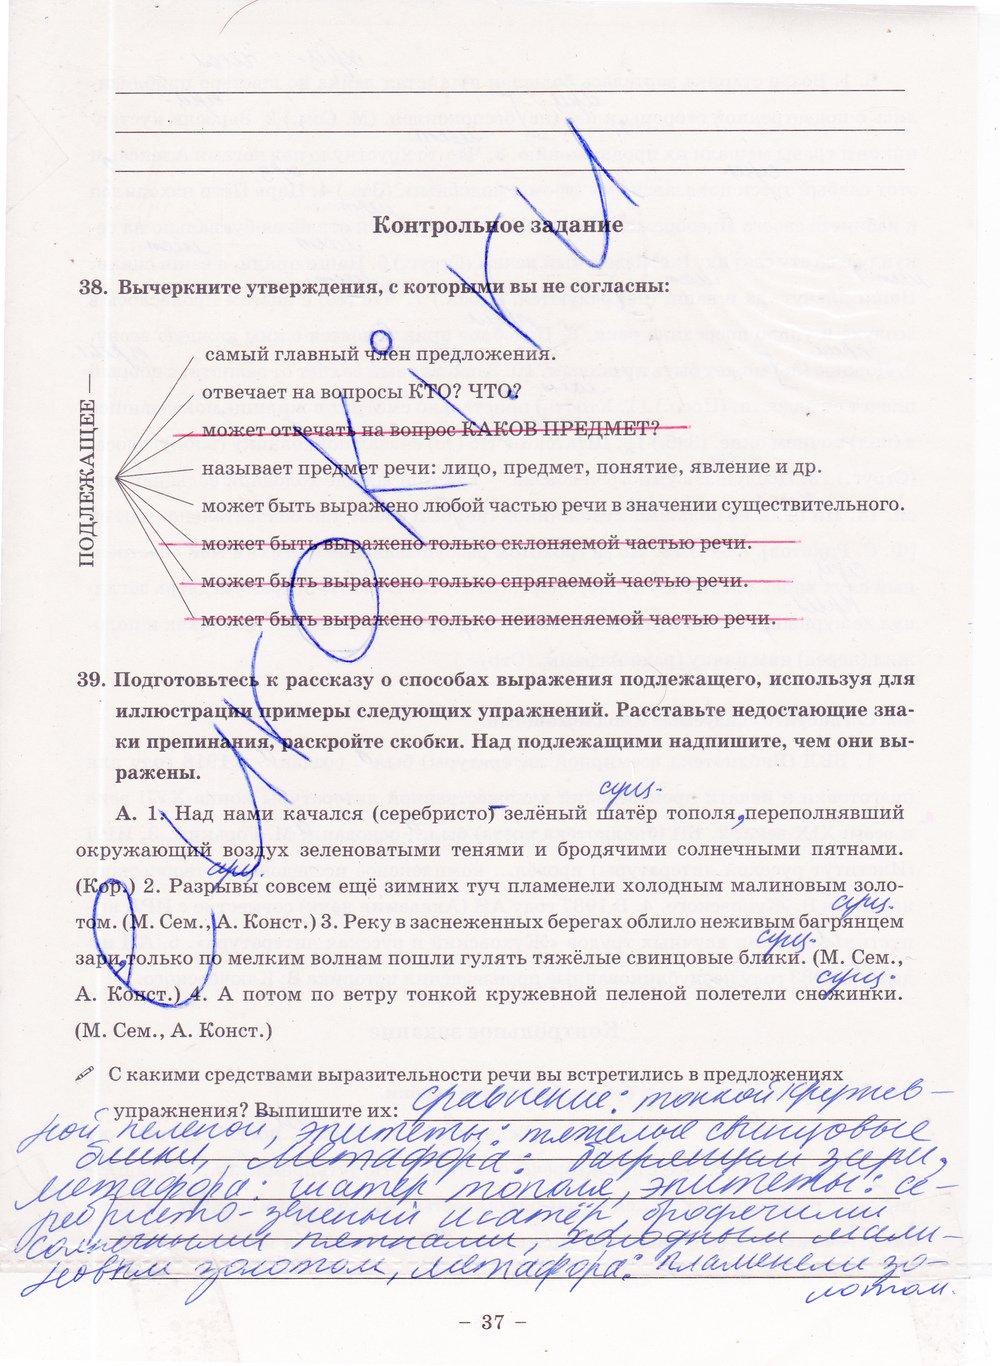 ч.1 класс богданова русскому гдз рабочая 8 языку по тетрадь